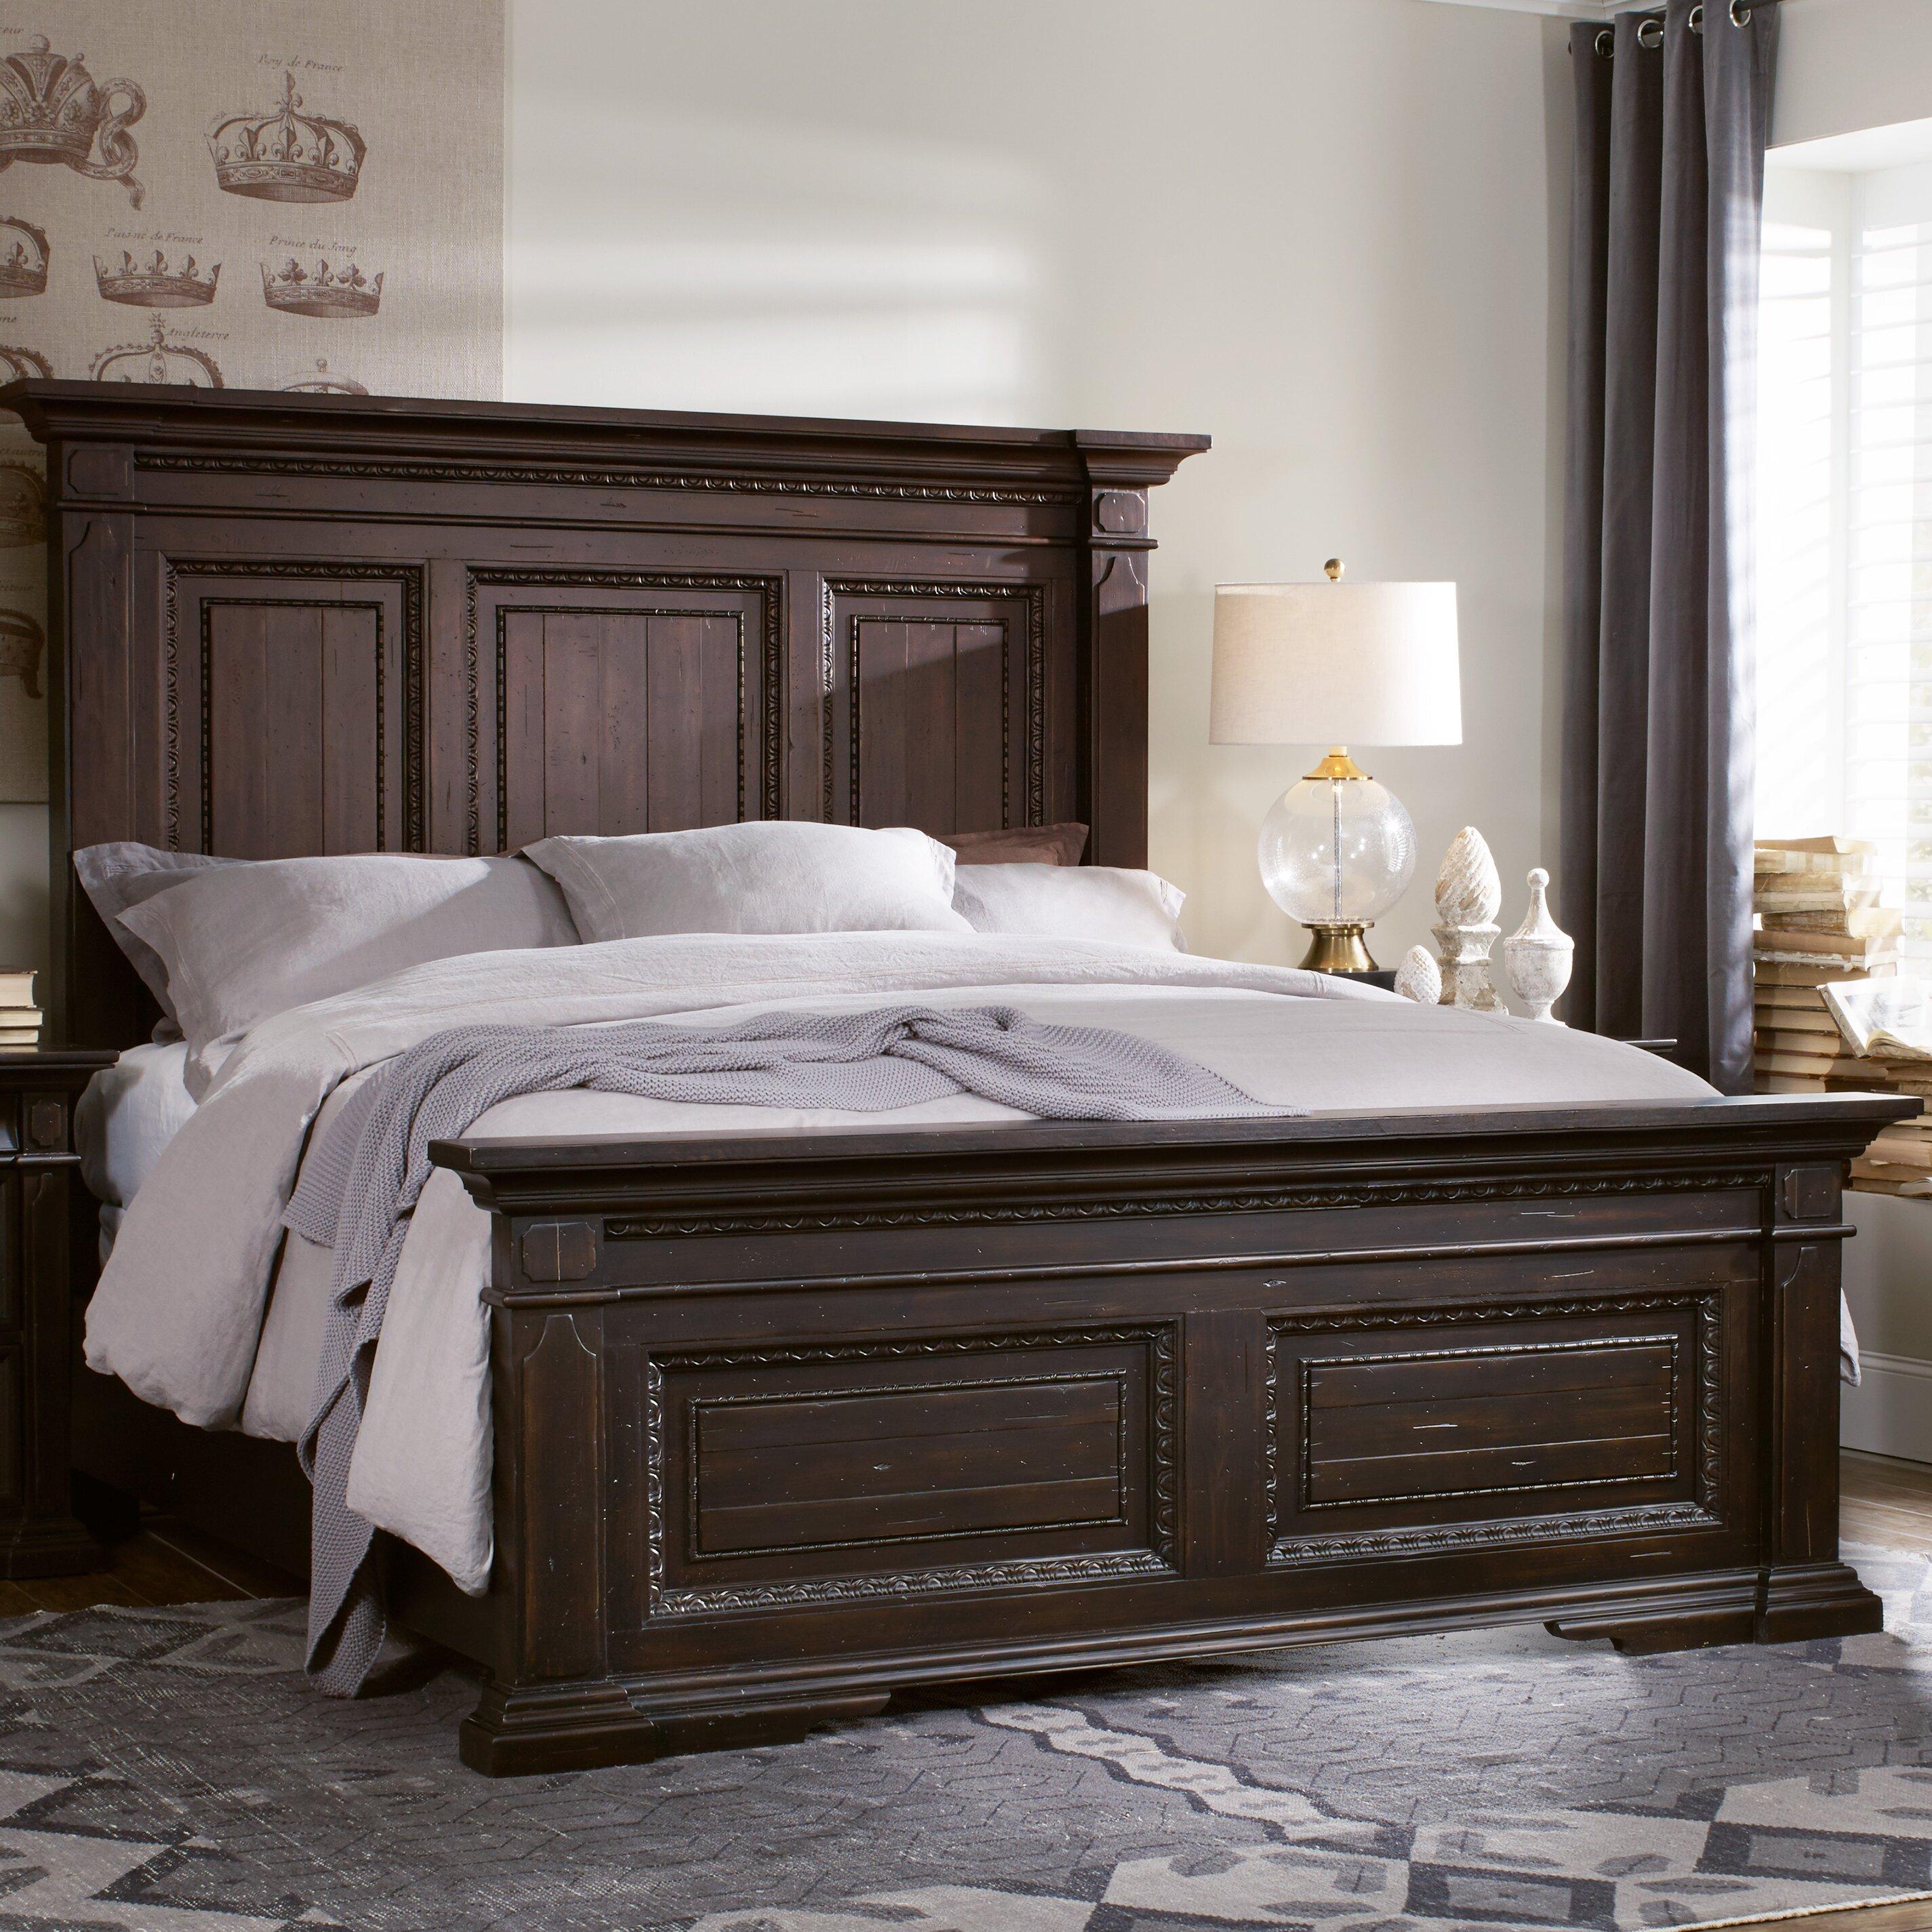 Hooker Furniture Treviso Panel Bed Reviews